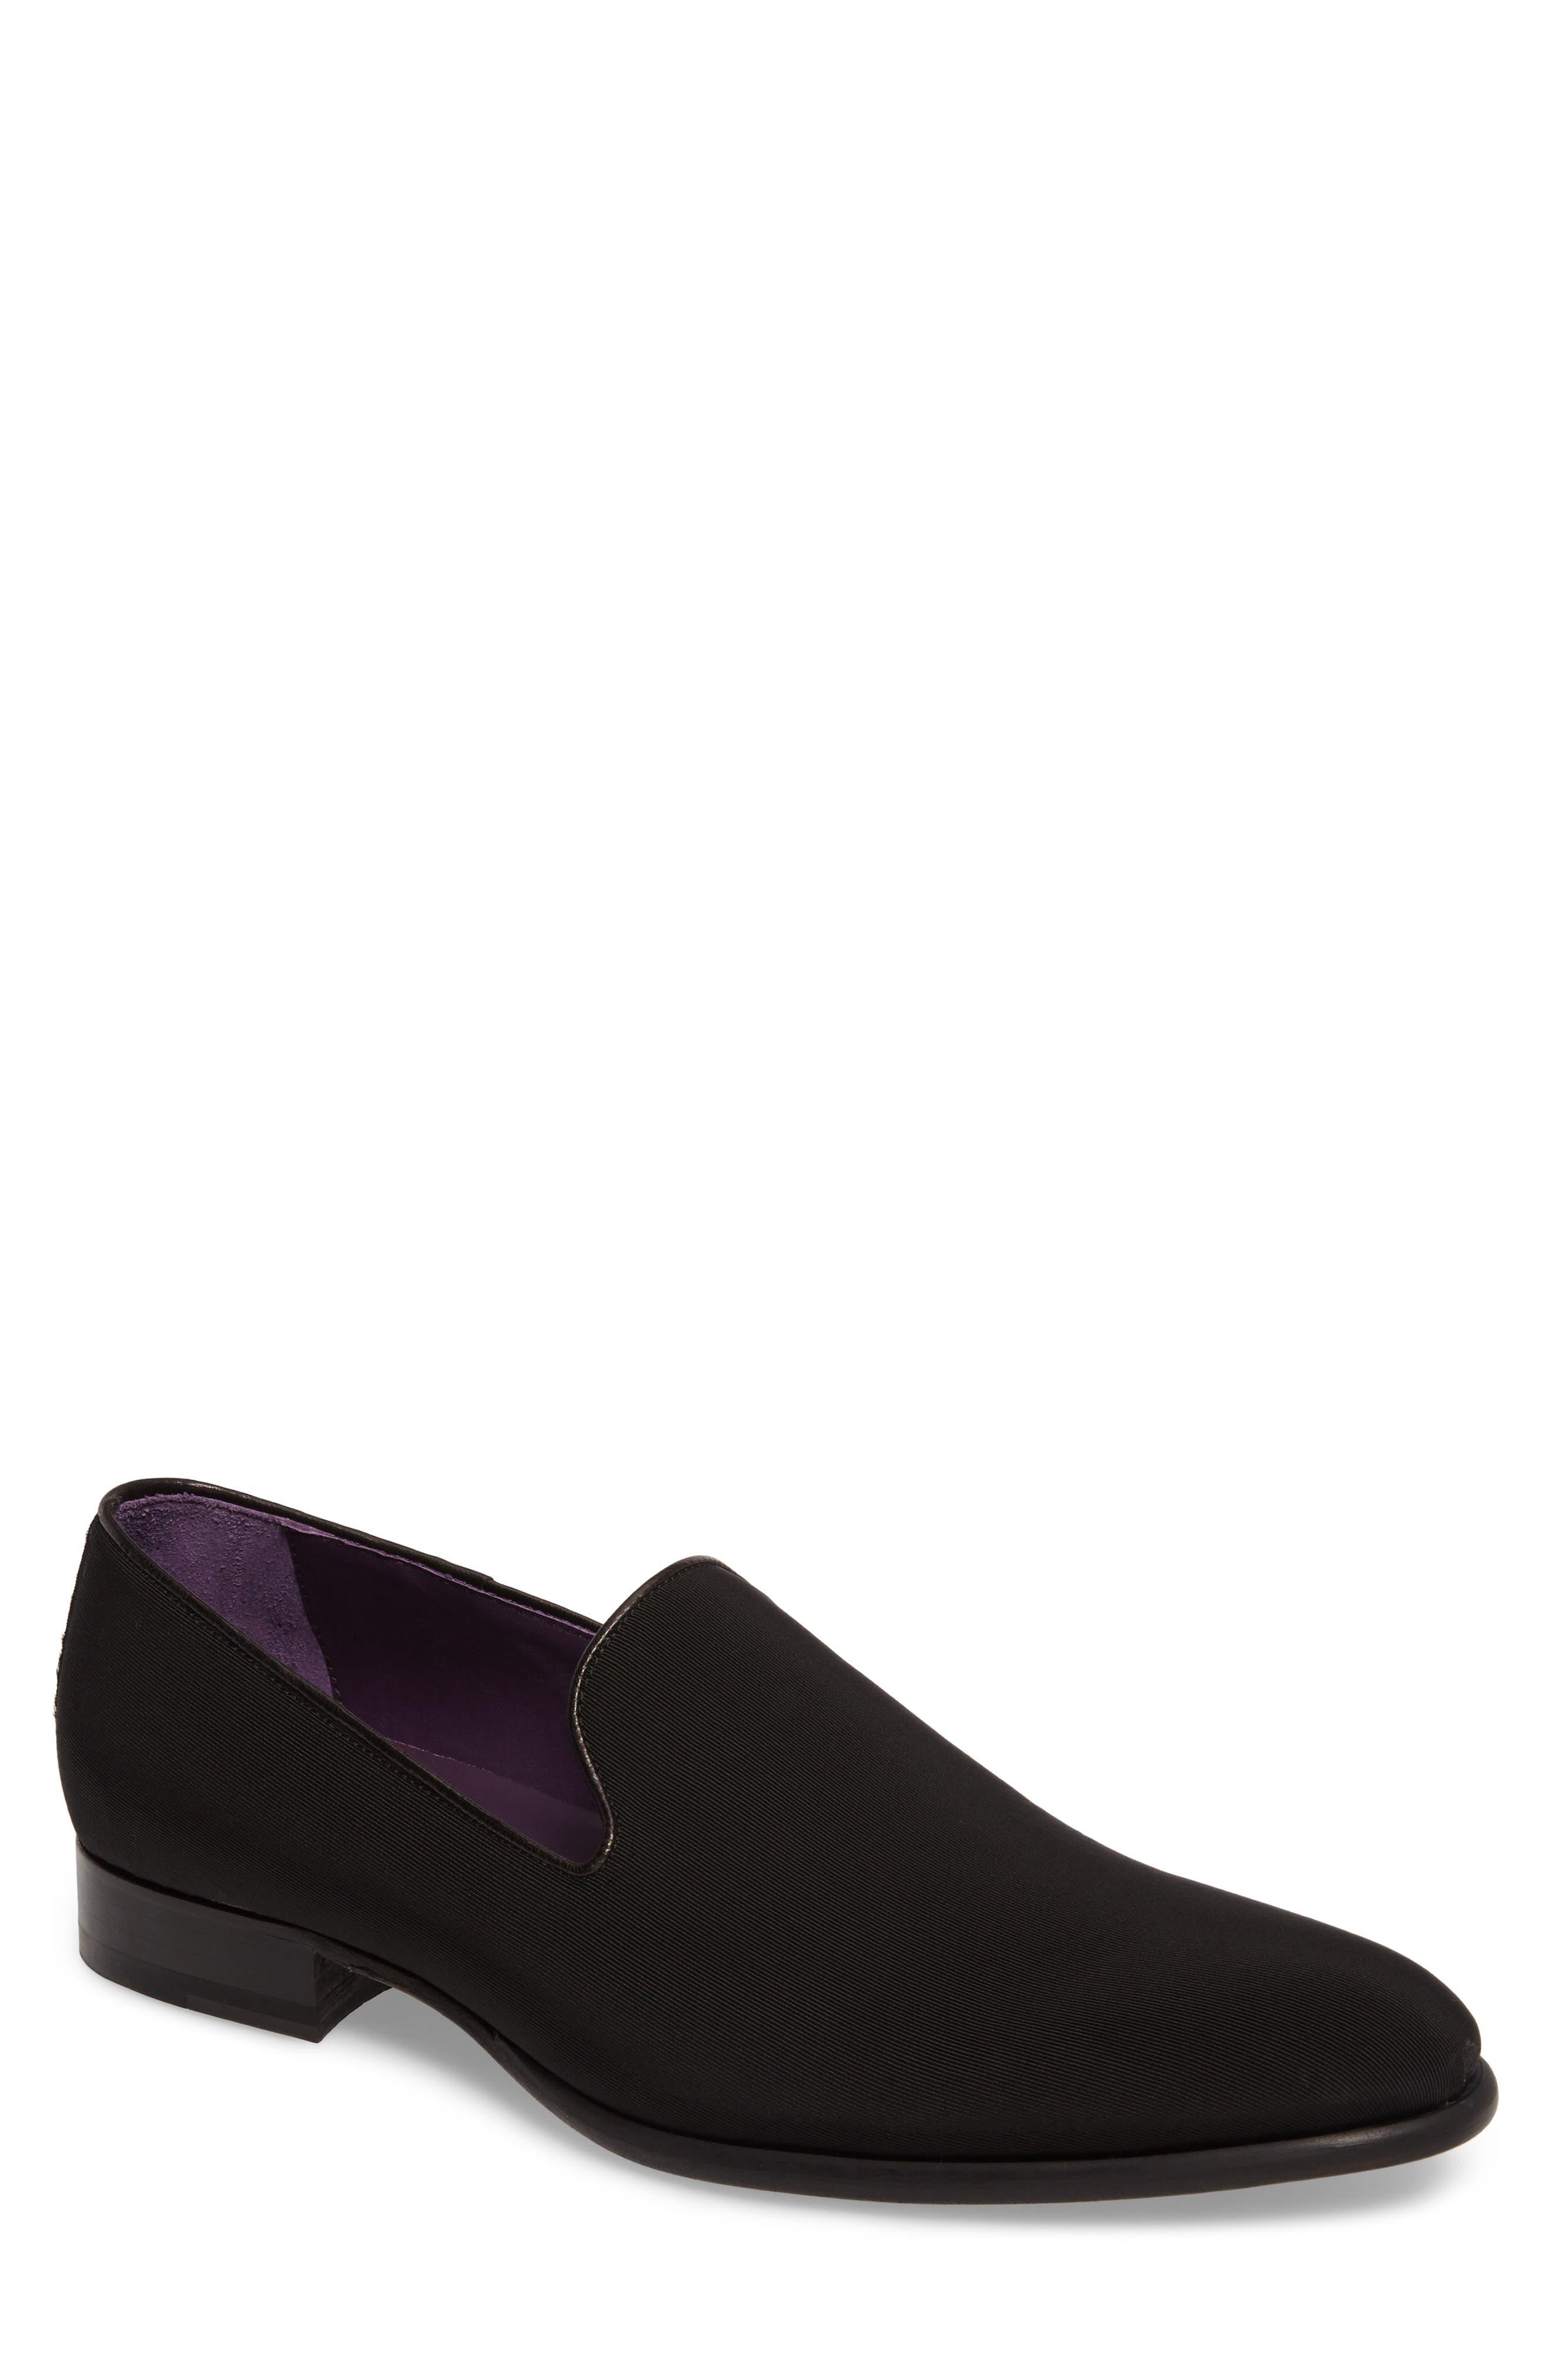 Broadway Venetian Loafer,                         Main,                         color, BLACK